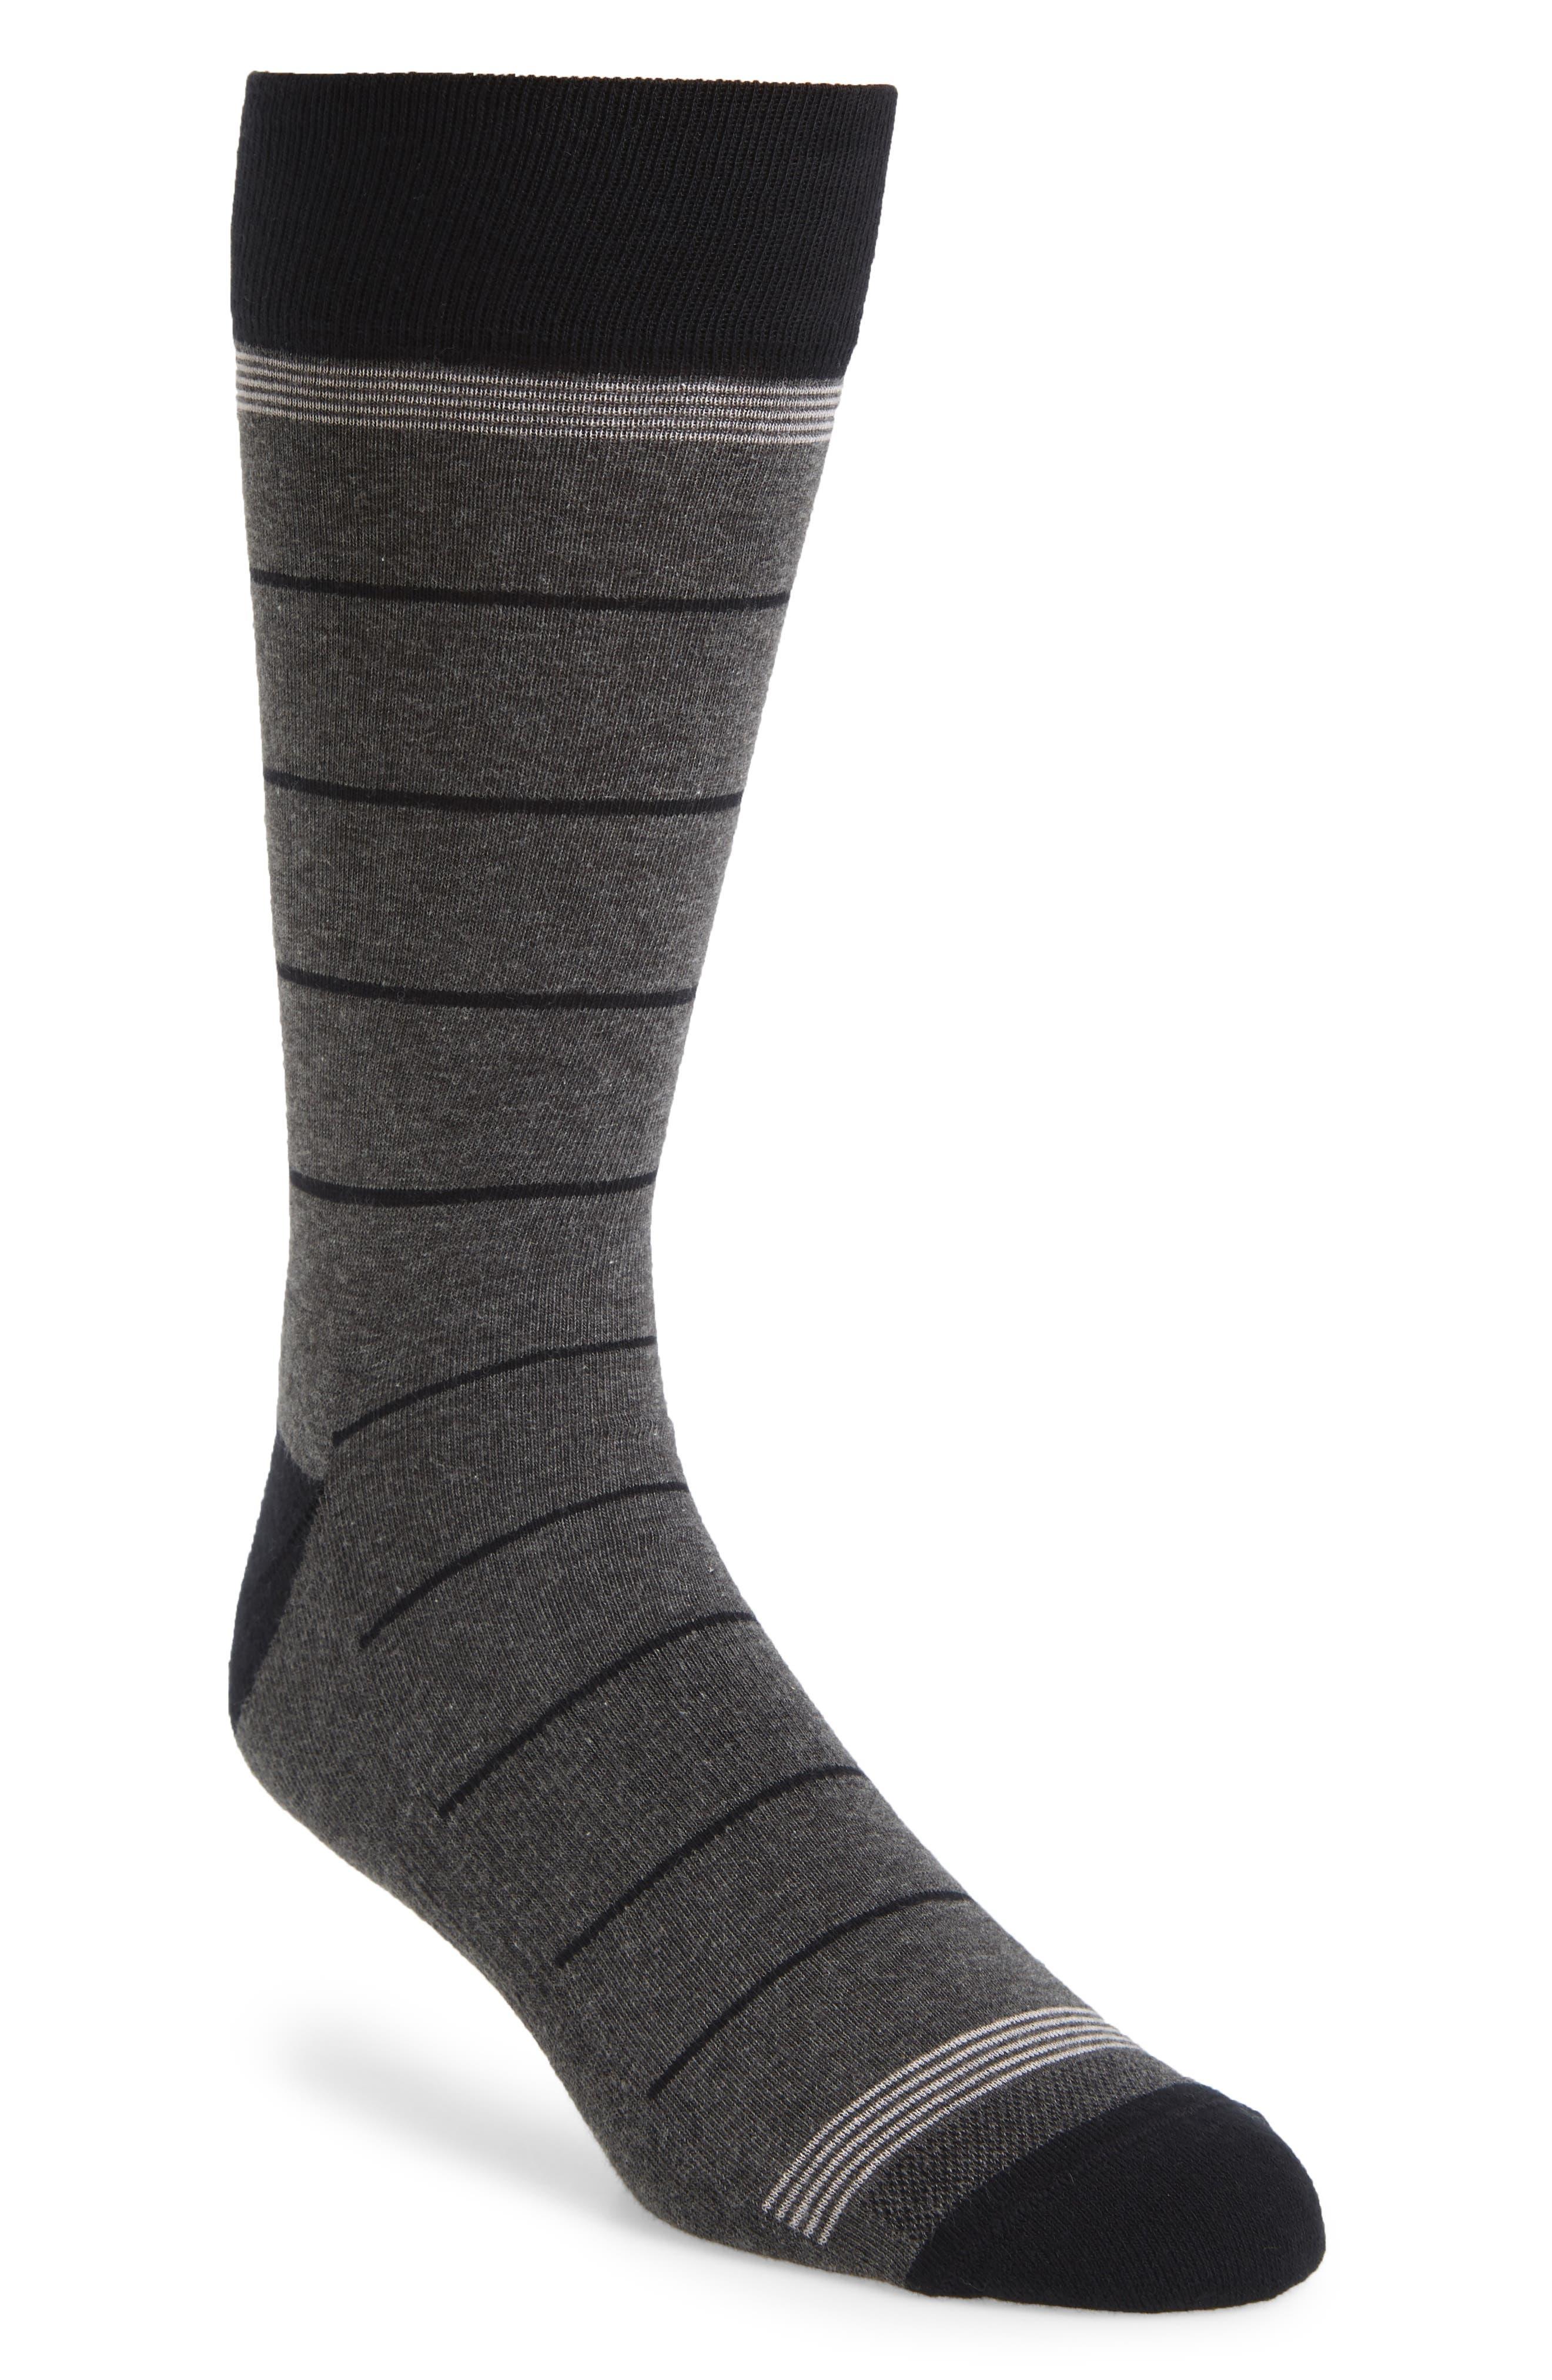 NORDSTROM MEN'S SHOP Stripe Socks, Main, color, CHARCOAL/ BLACK